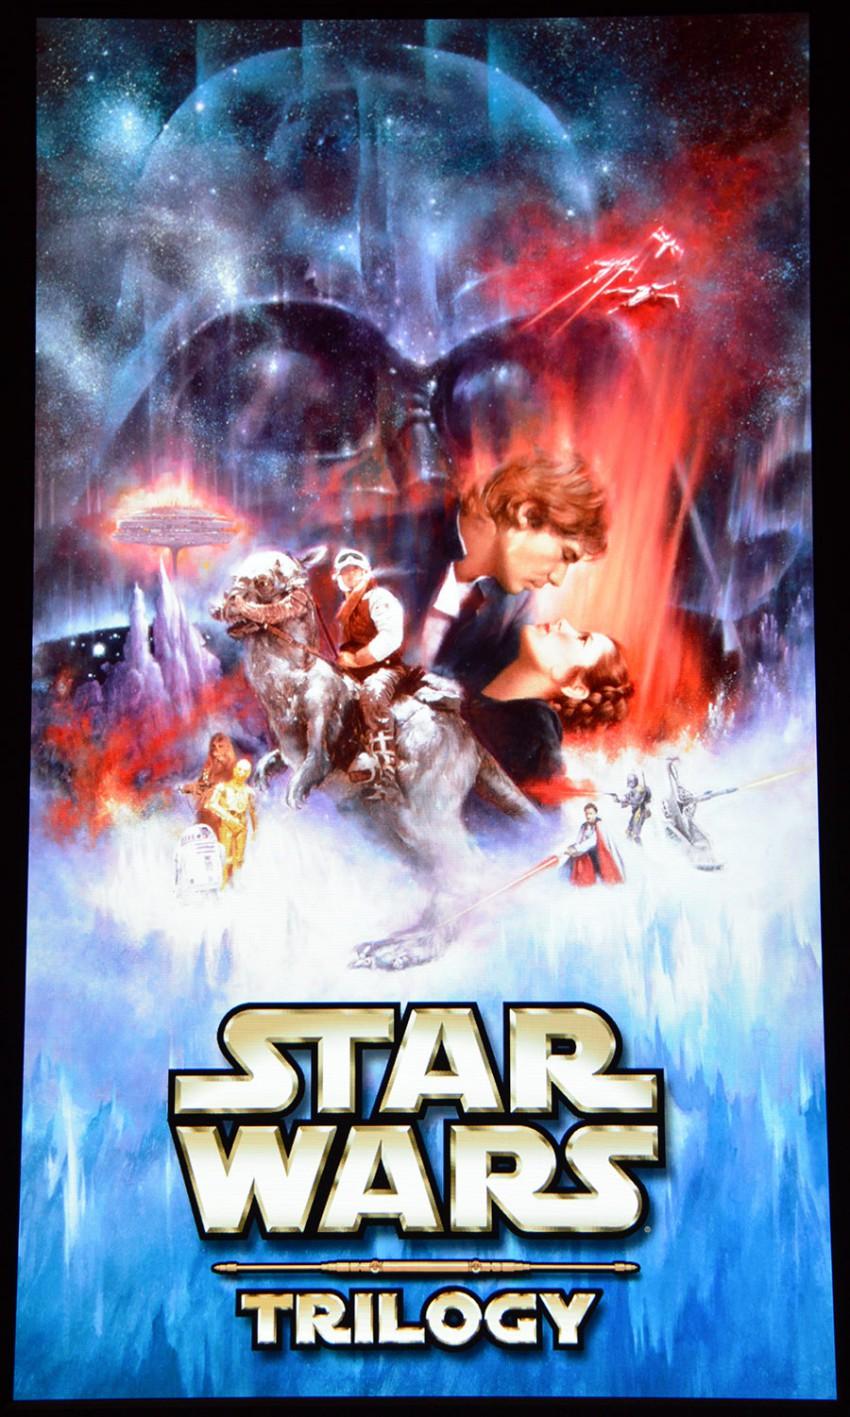 Igt star wars slots